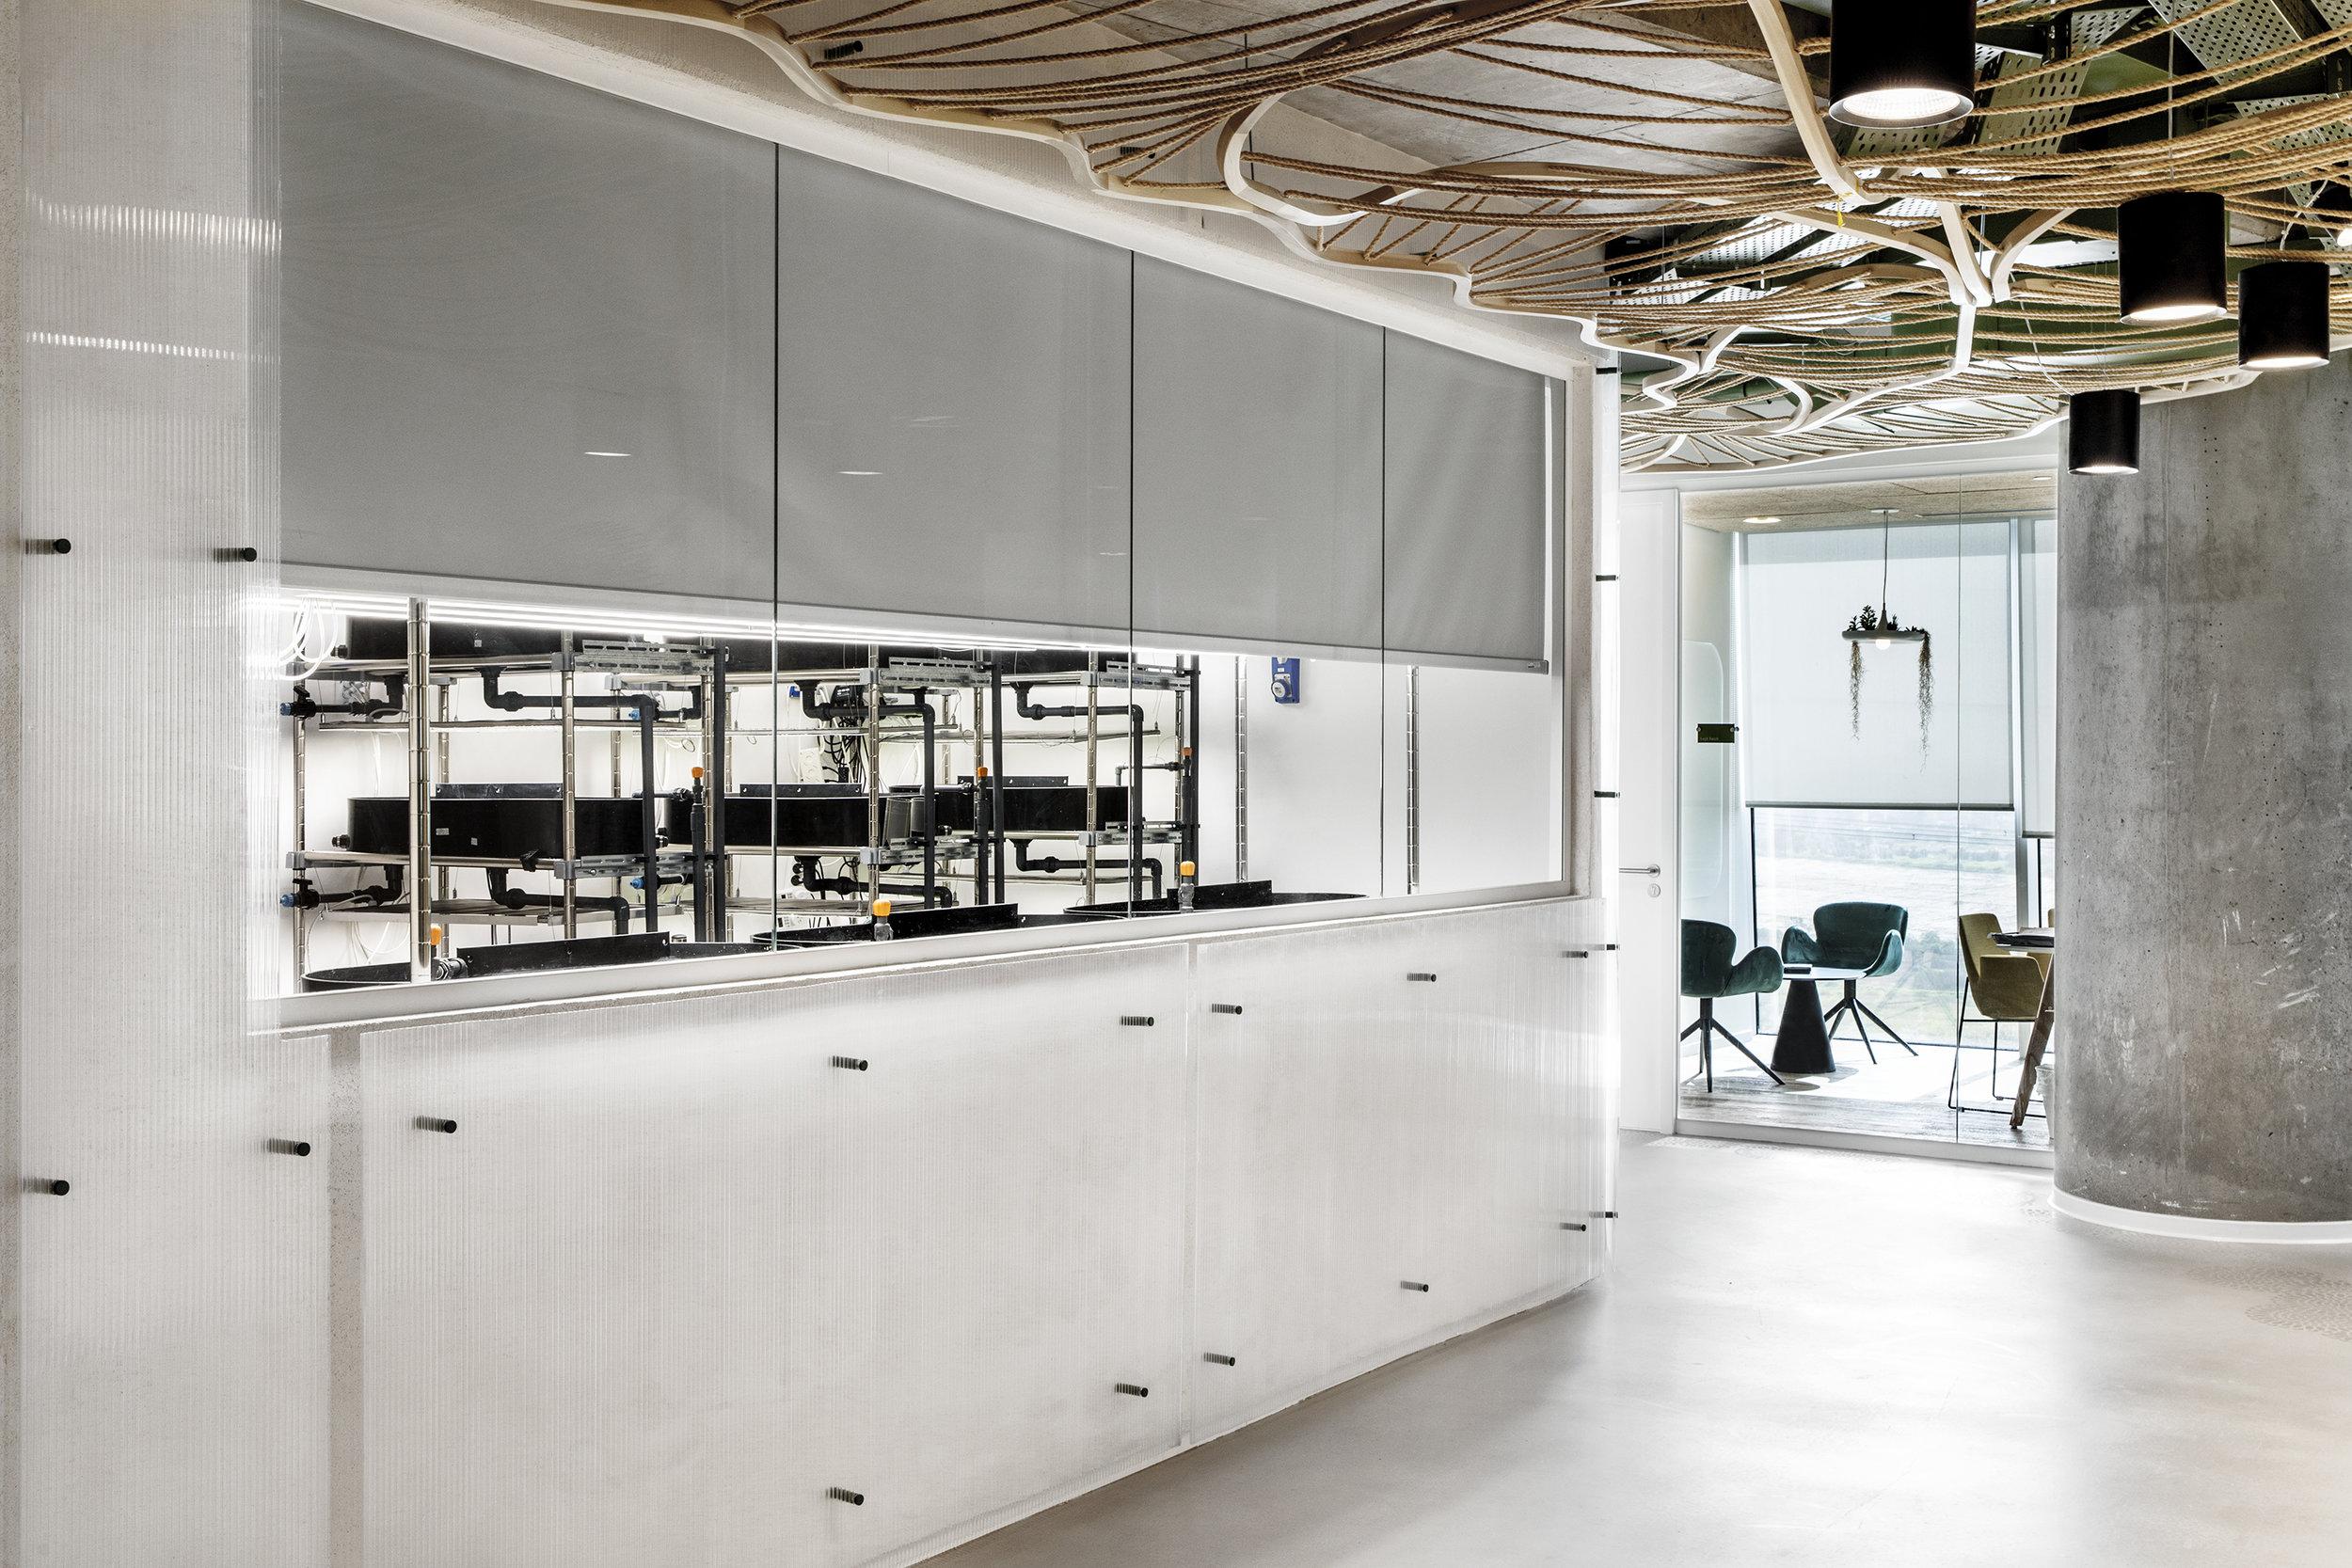 HINNOMAN - ROY DAVID ARCHTECTURE - STUDIO - סטודיו רואי דוד - אדריכלים (30).jpg